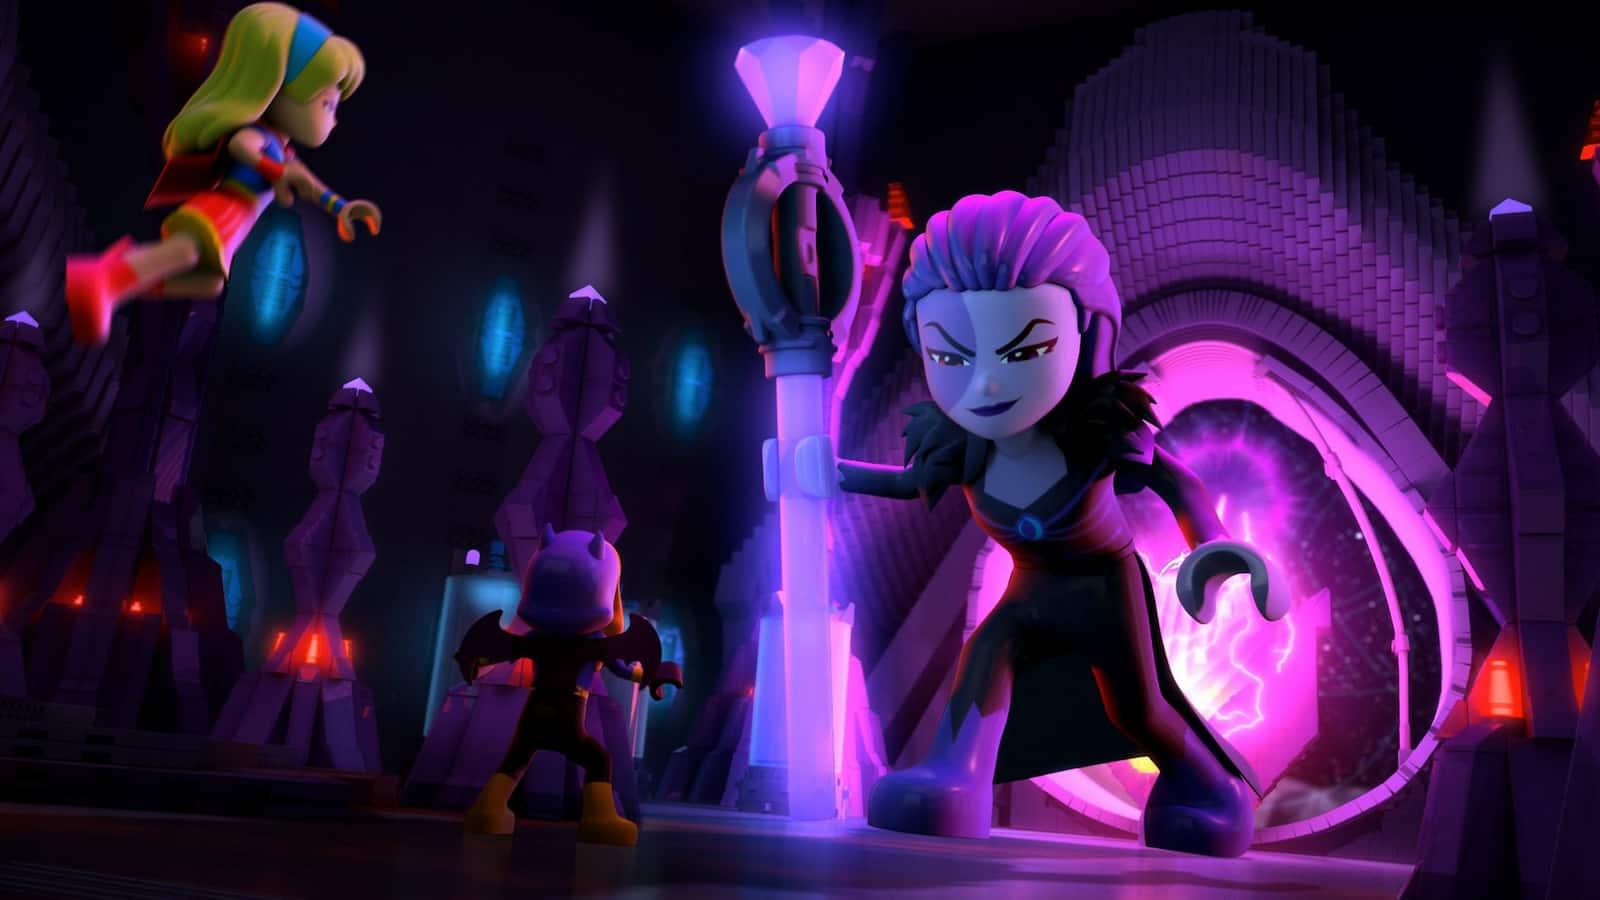 lego-dc-super-hero-girls-brain-drain-2017